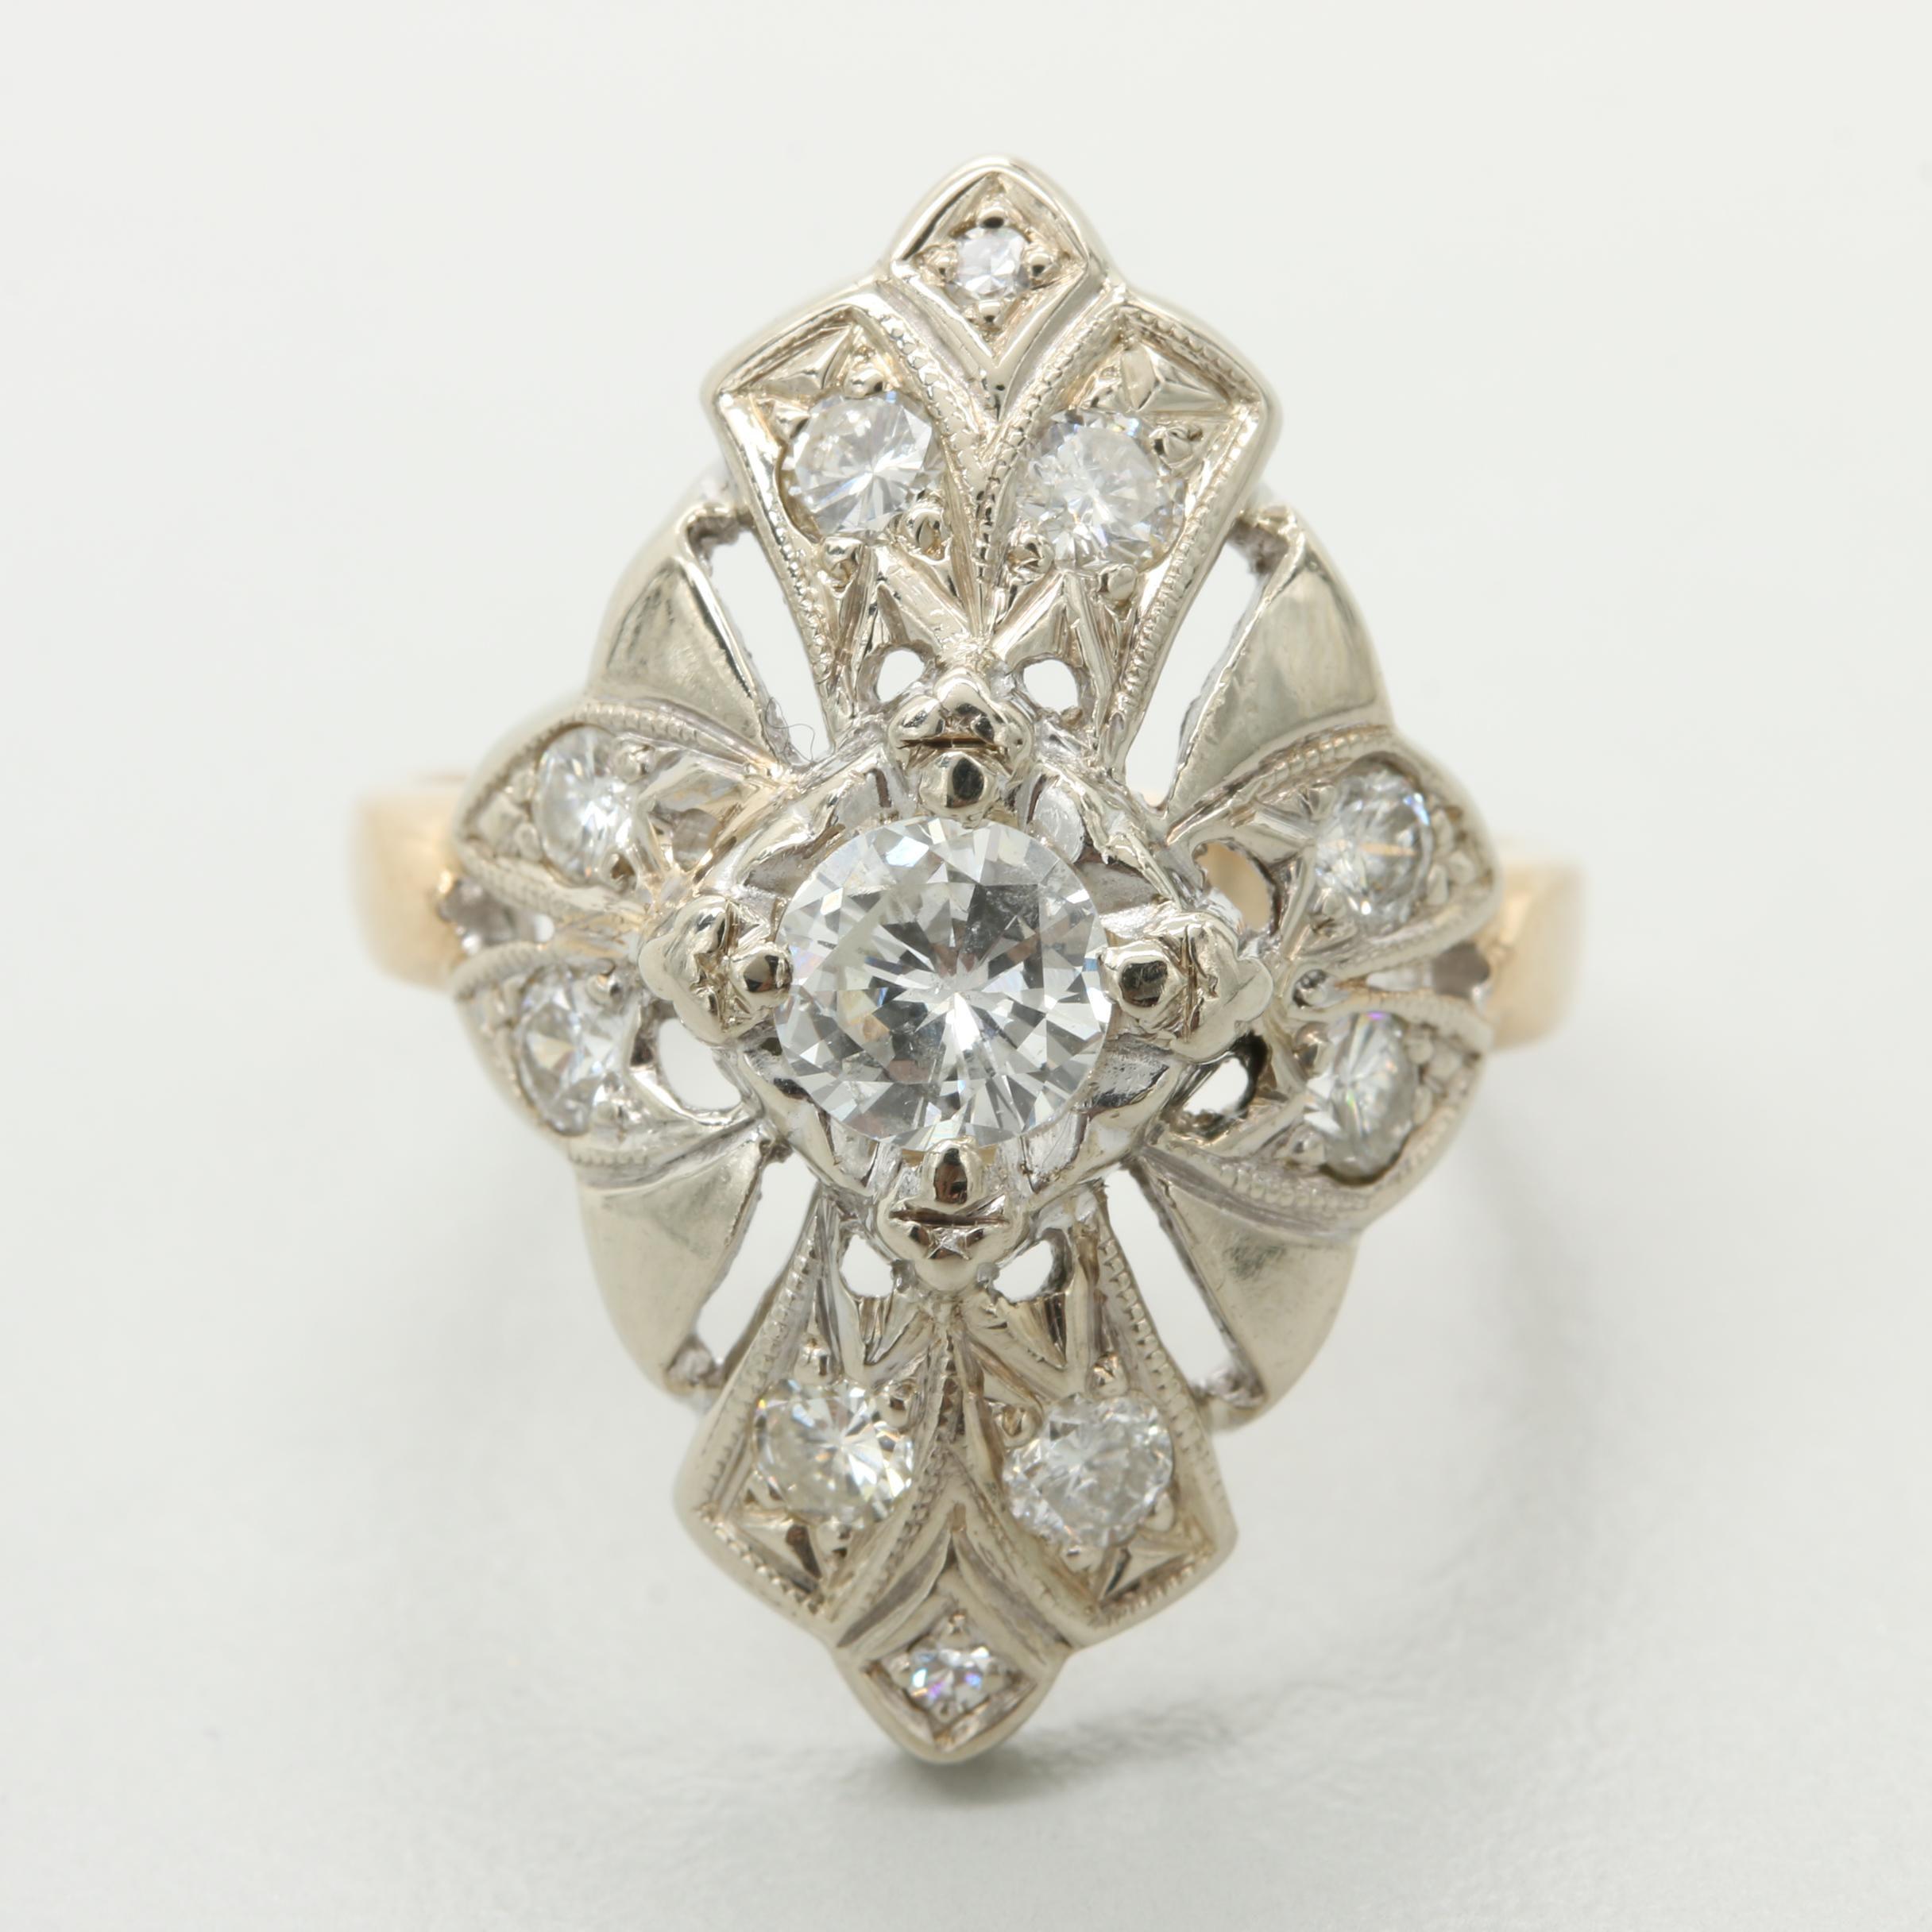 Circa 1930s Kinsley-Kovsky 14K White and Yellow Gold Diamond Ring